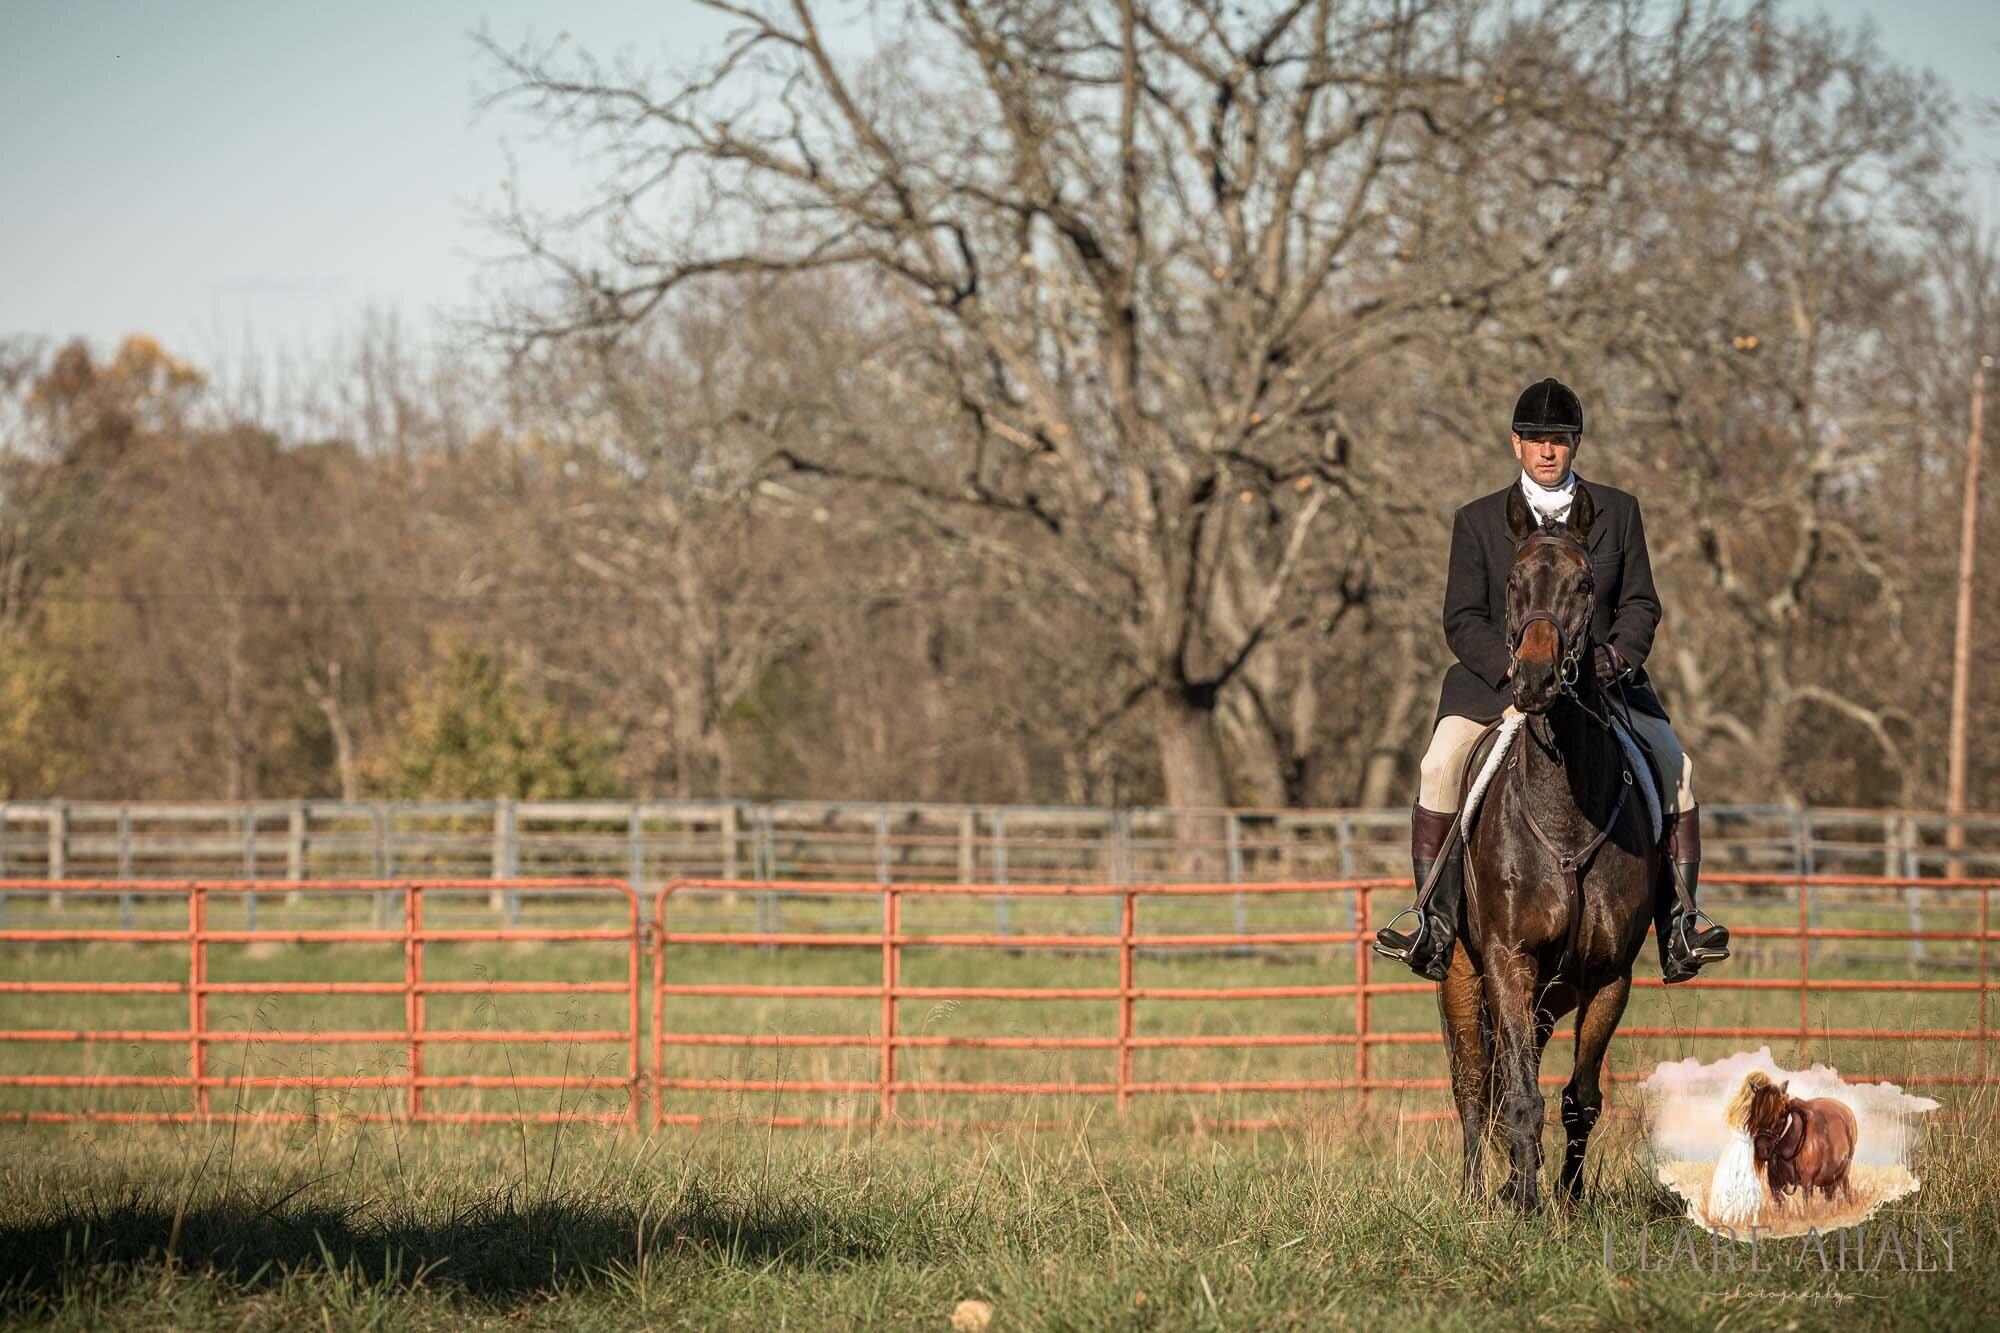 equine_photographer_potomac_md_equine_photographer_middleburg_VA_equine_portraiture_loudon_county_VA-1300.jpg